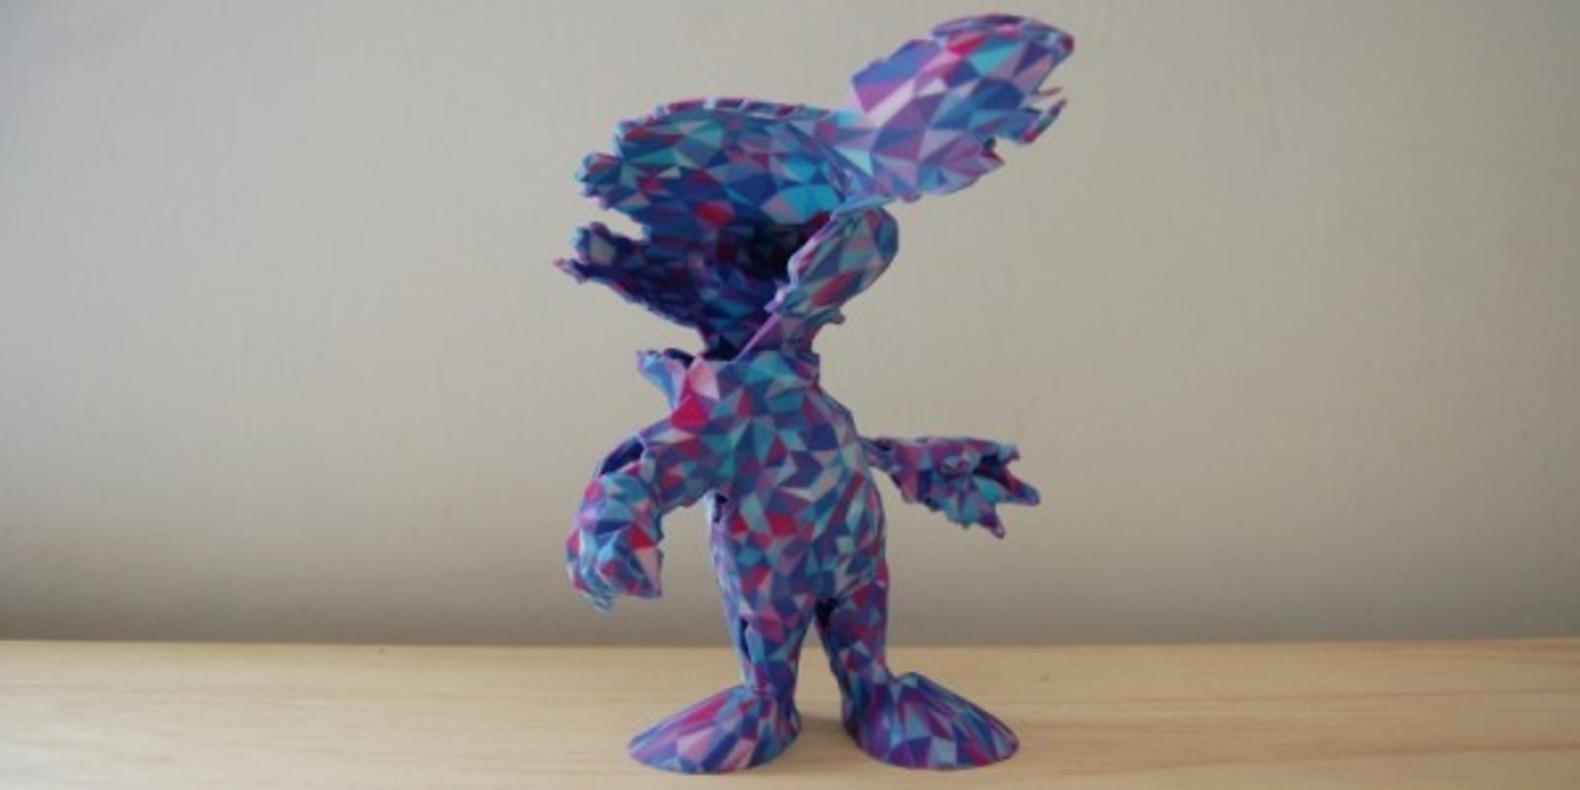 sekuMoiMecy Matthew Plummer-Fernandez impression 3D printing cults fichier mickey mouse 2